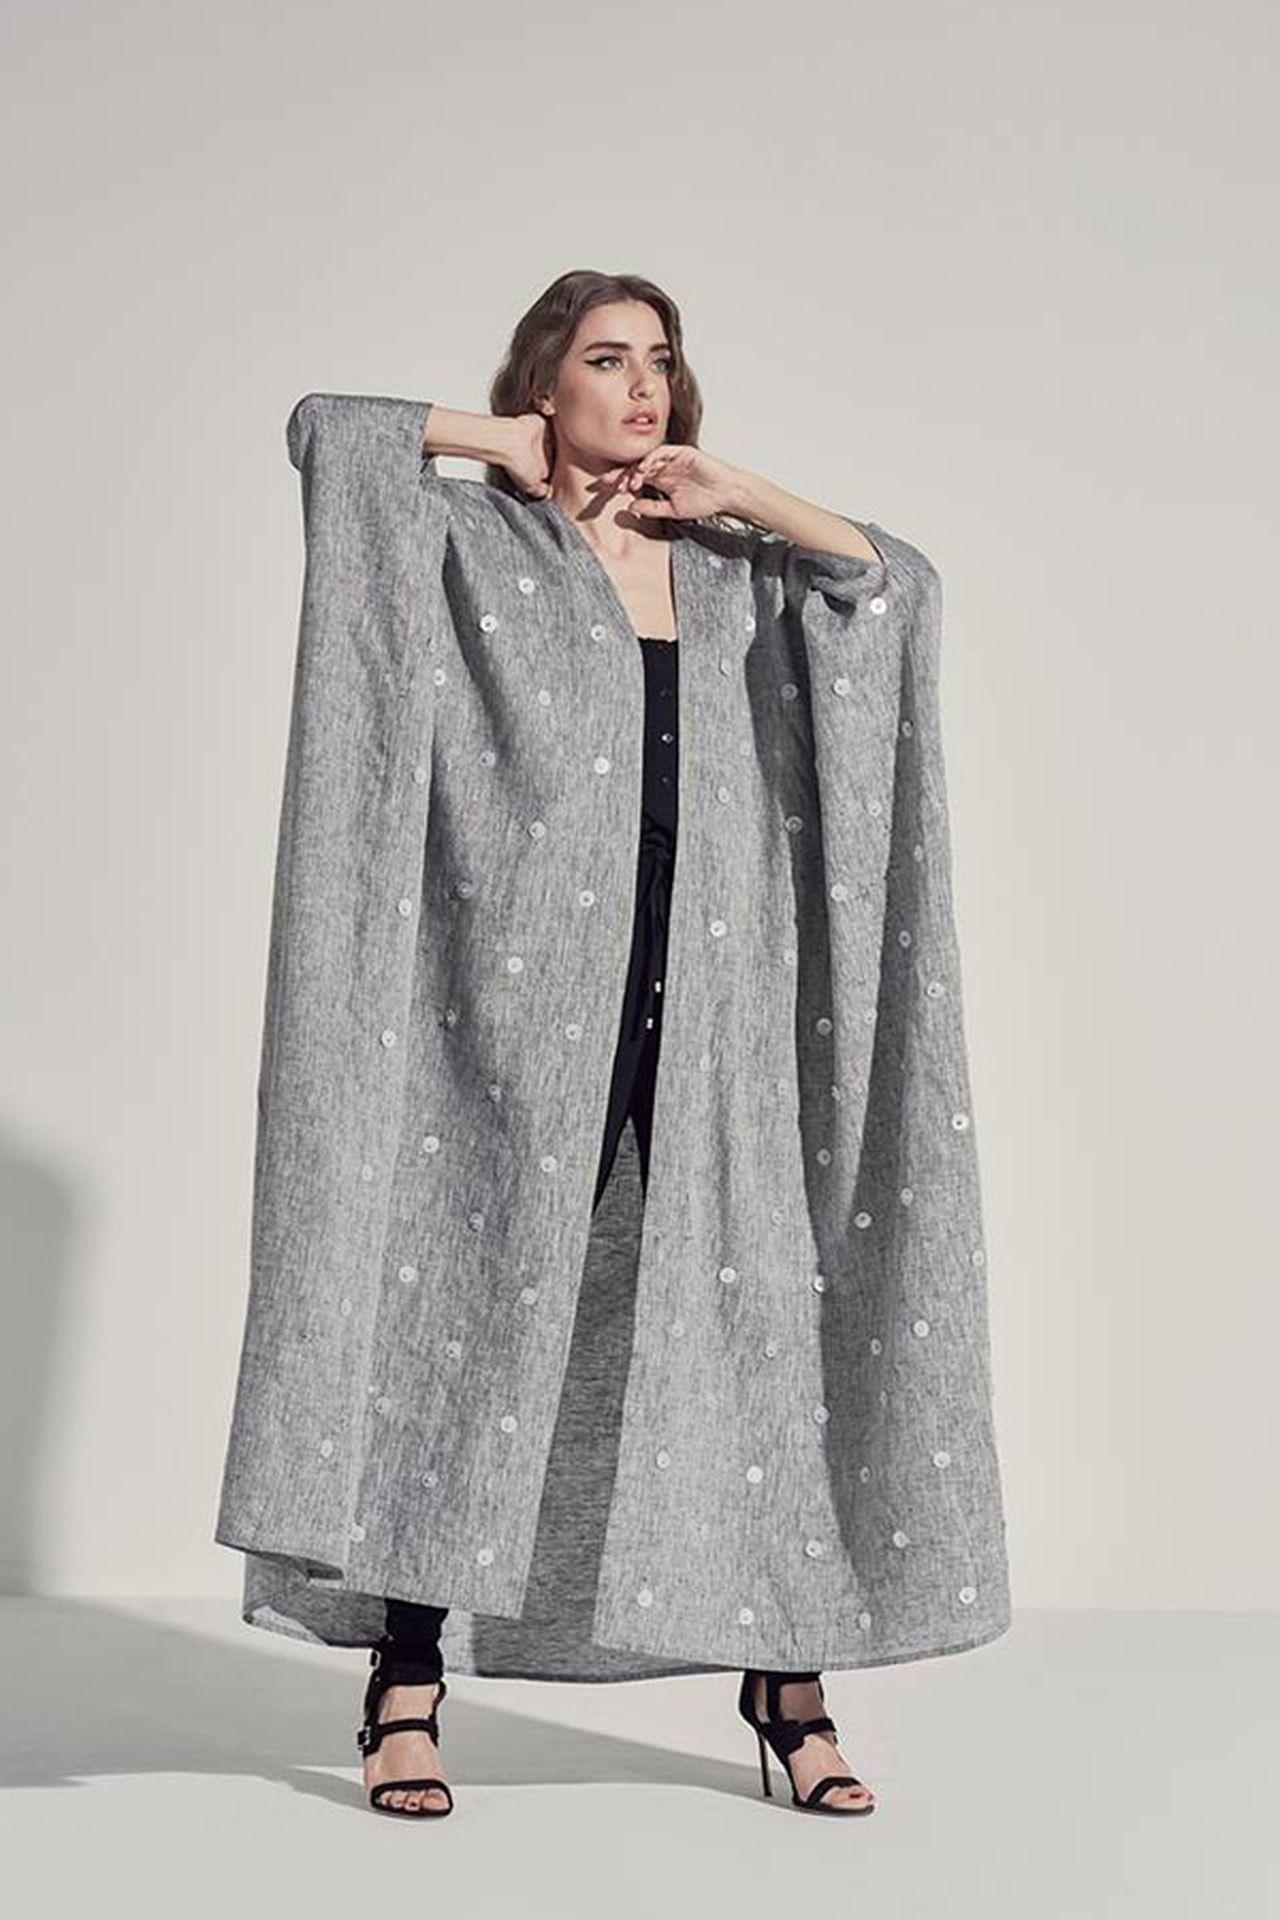 6231d5083 9 ألوان عبايات لأناقة المرأة الخليجية في شتاء 2017 | Abaaya, cloaks ...